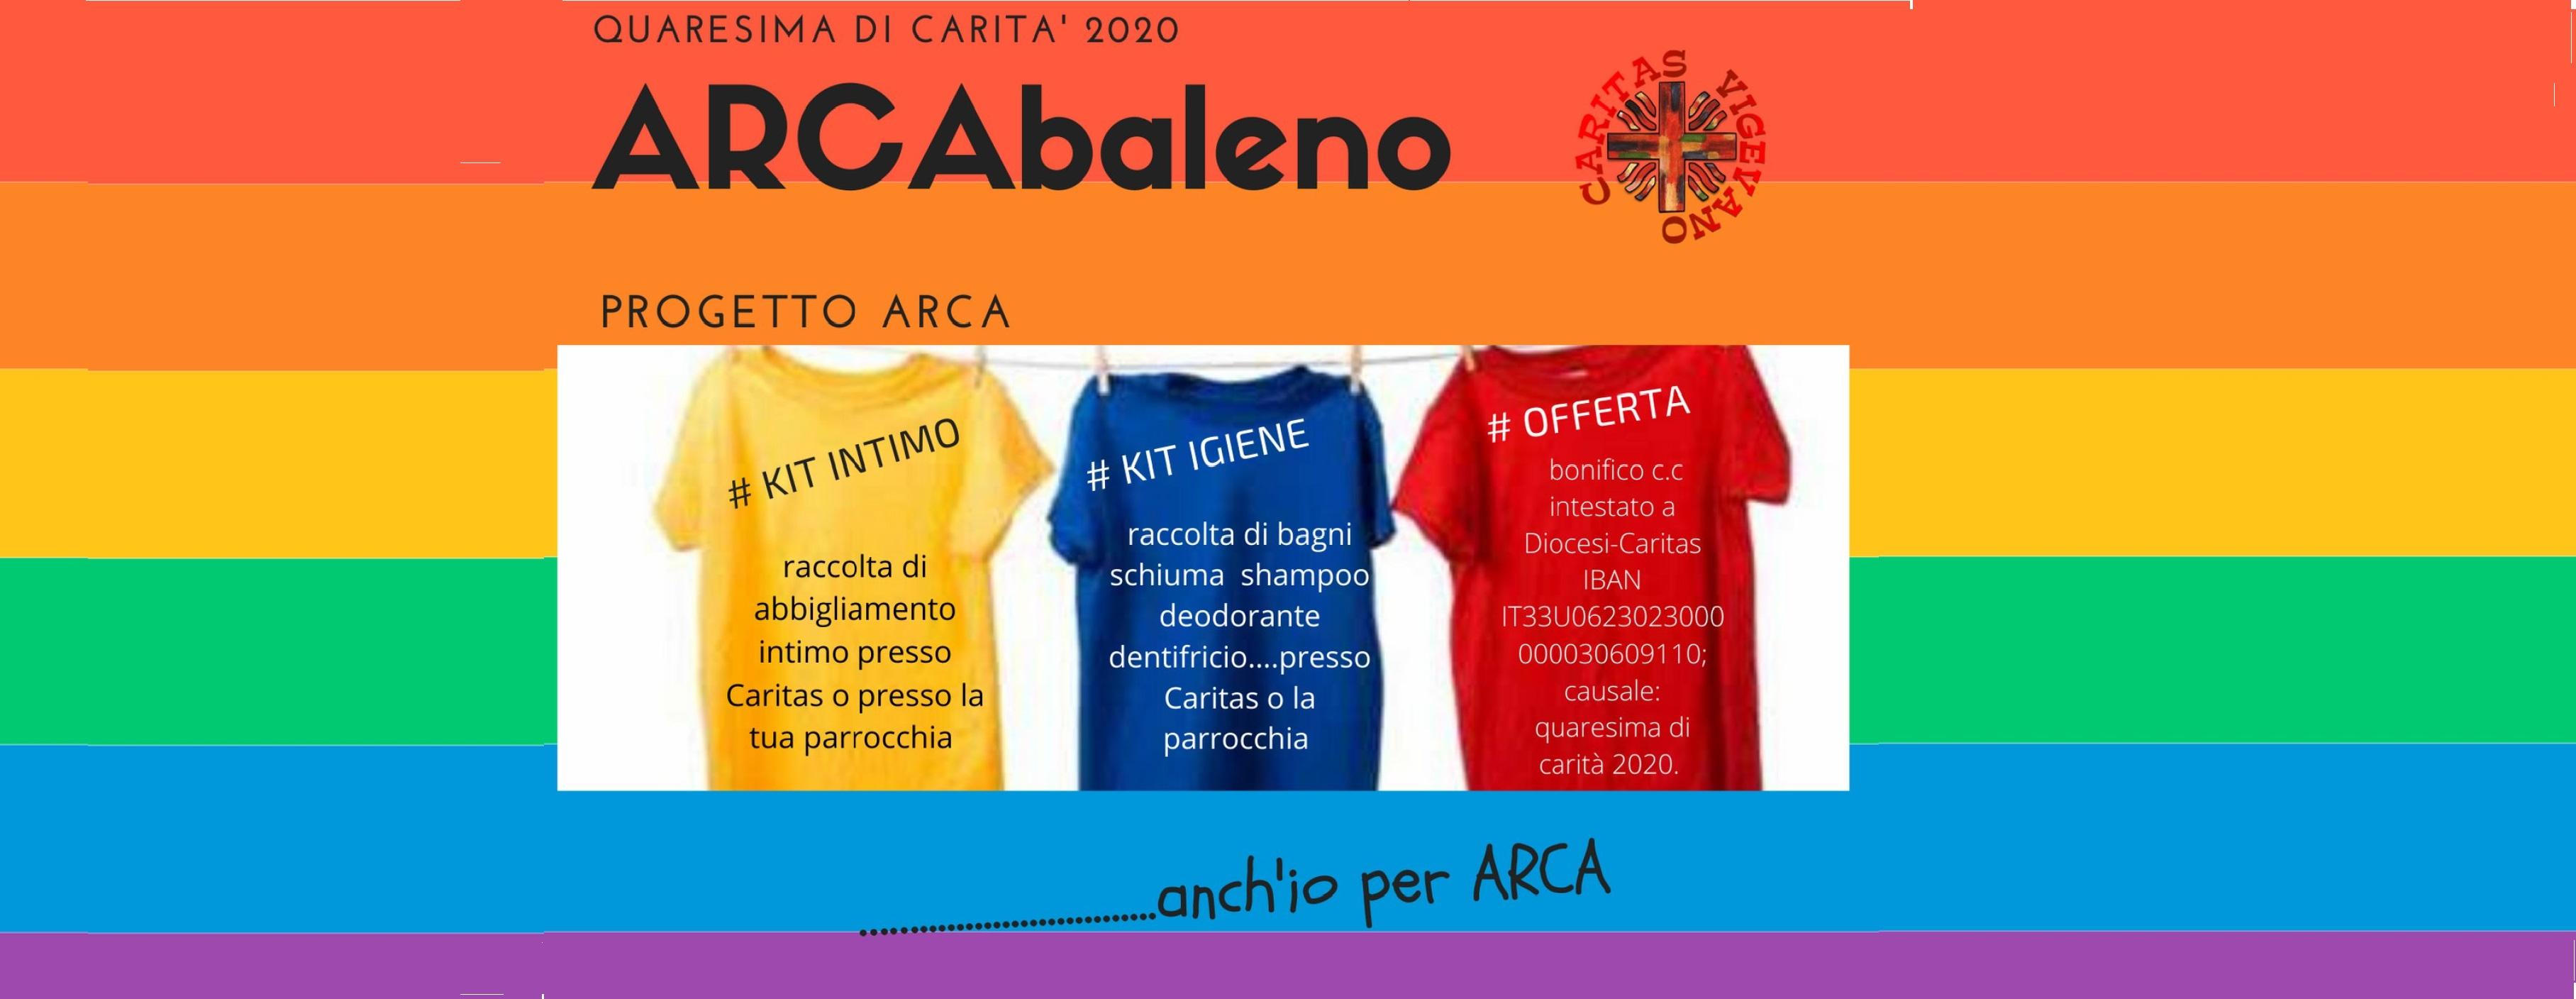 ARCAquaresimadicarita_2